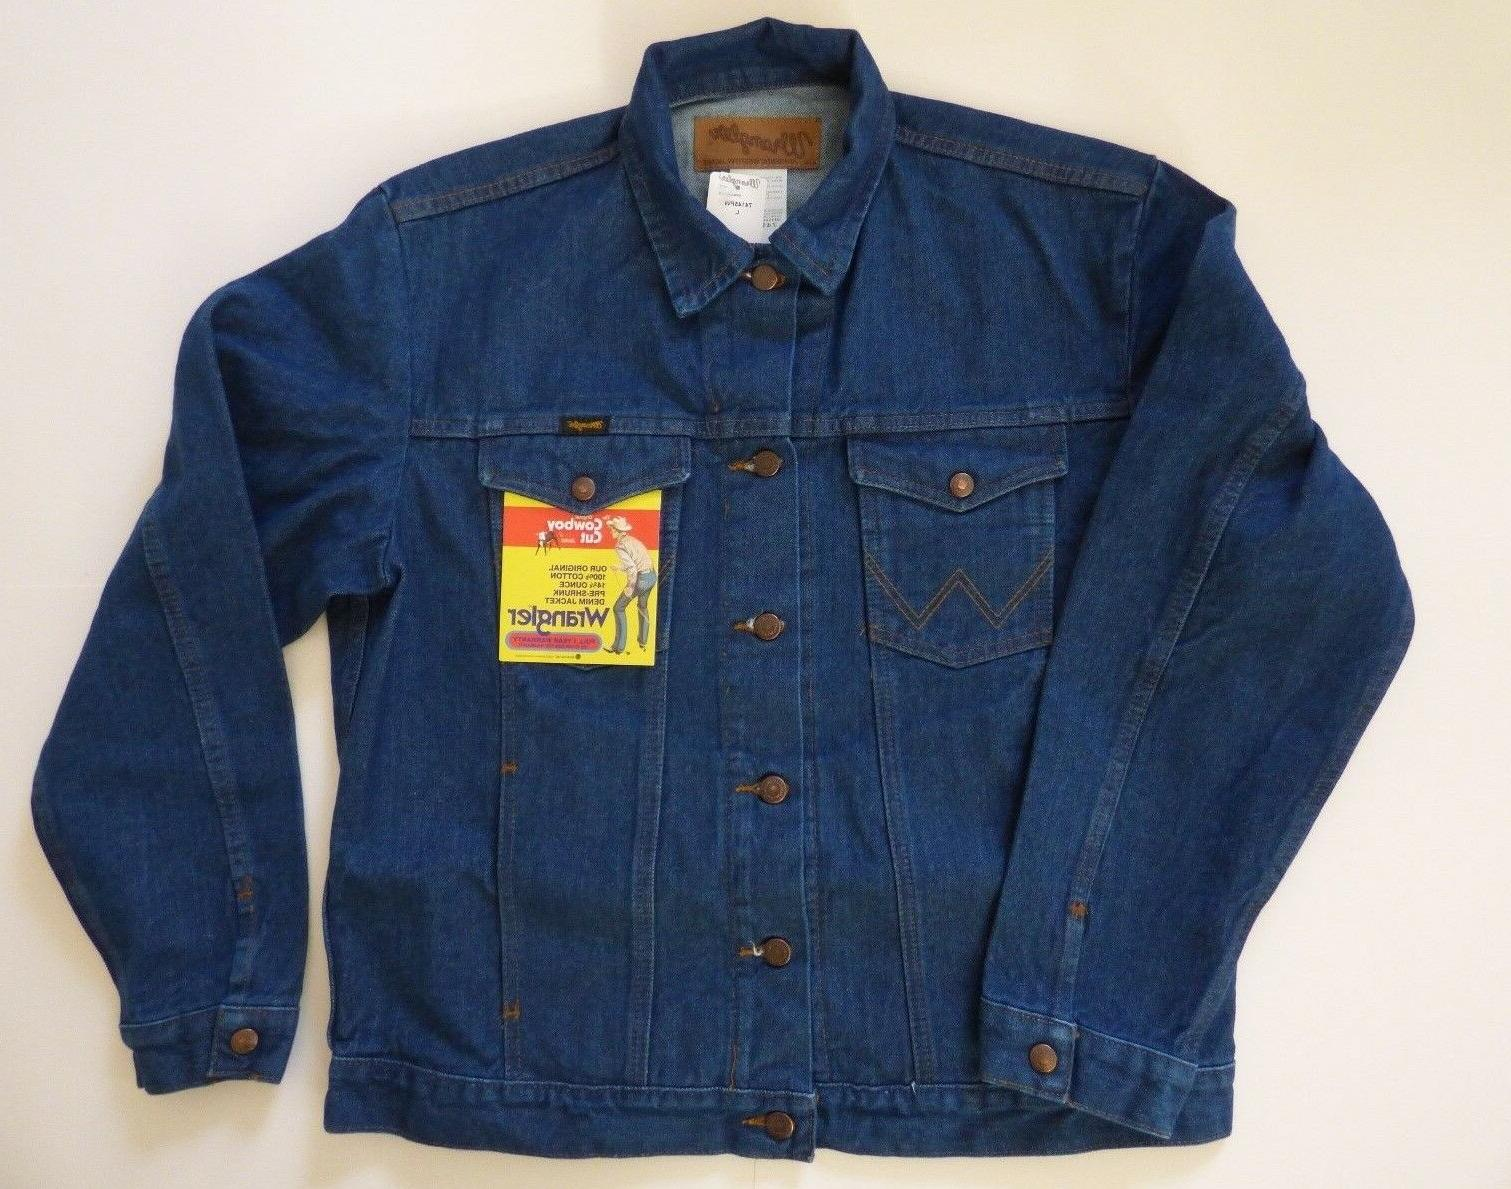 Mens Wrangler Cowboy Cut Unlined Denim Jacket - Inside Pocke